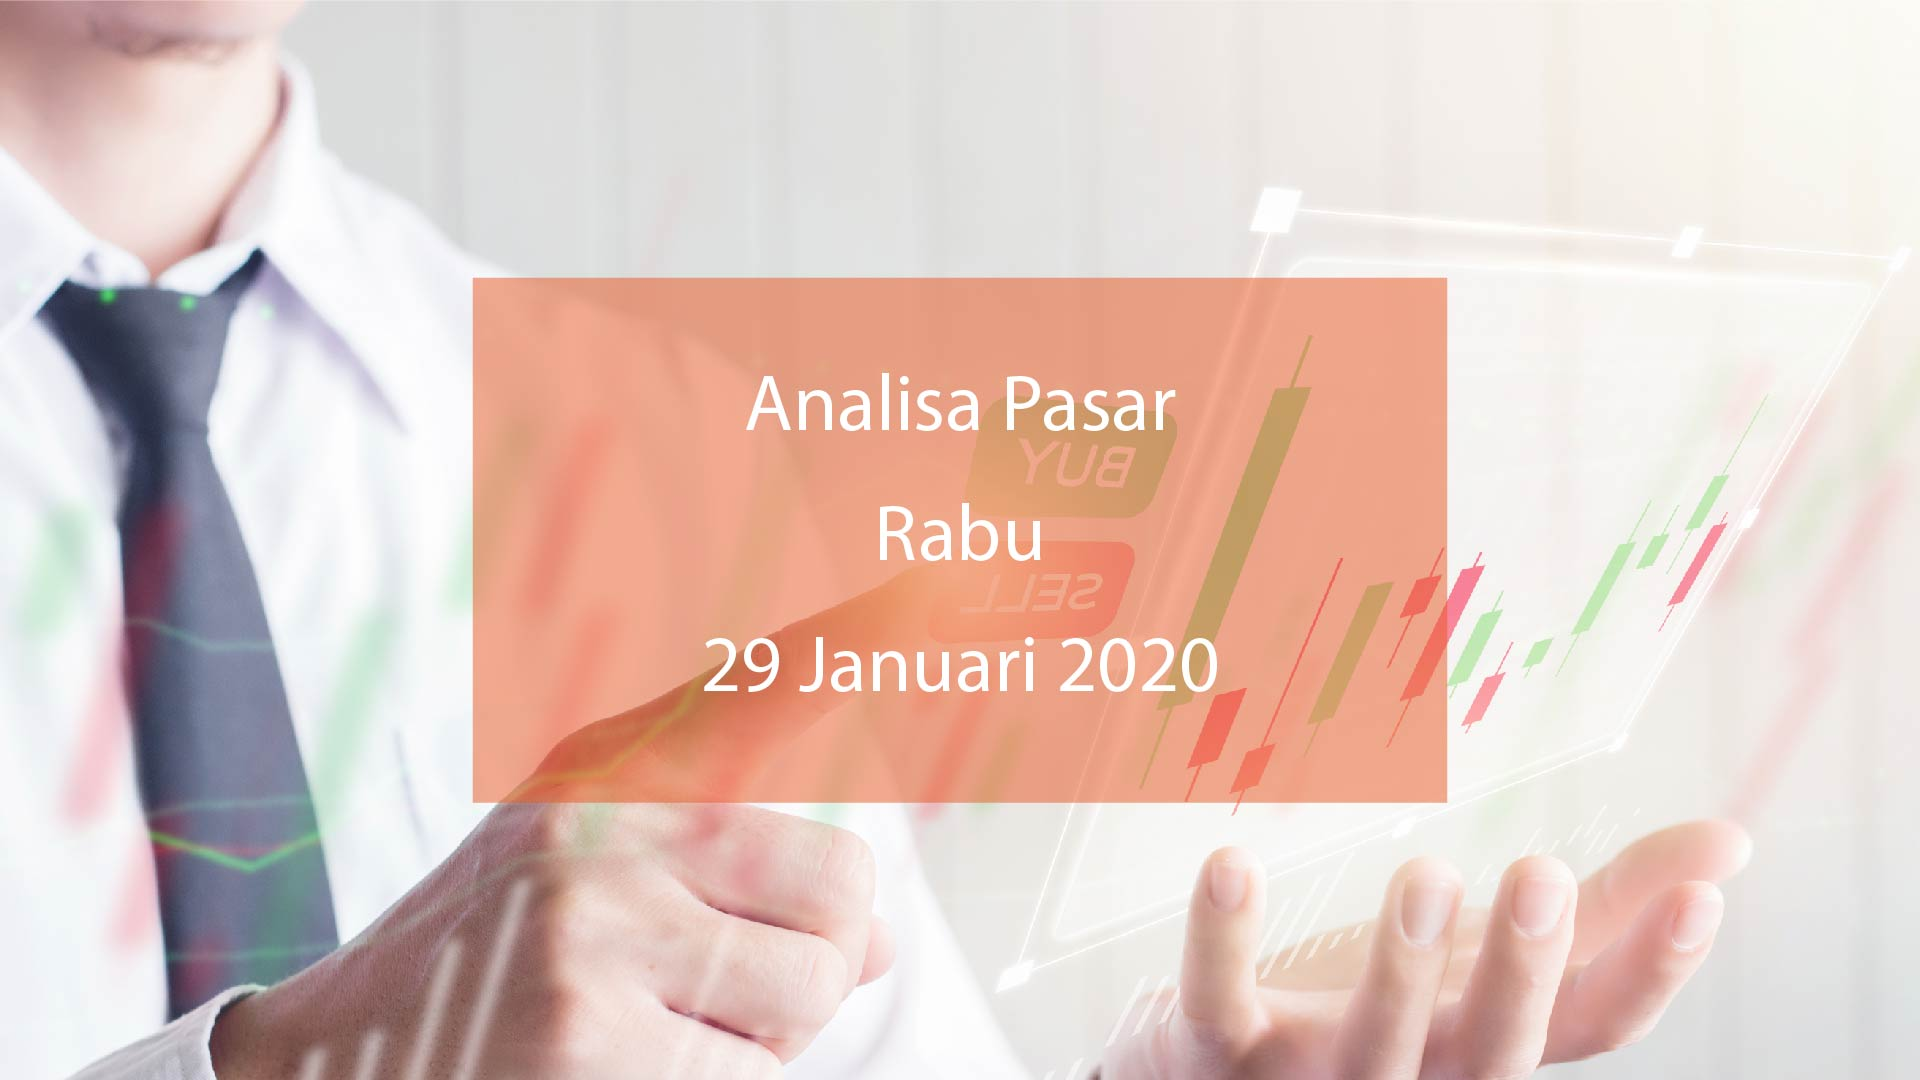 analisa pasar hsb 29 januari 2020